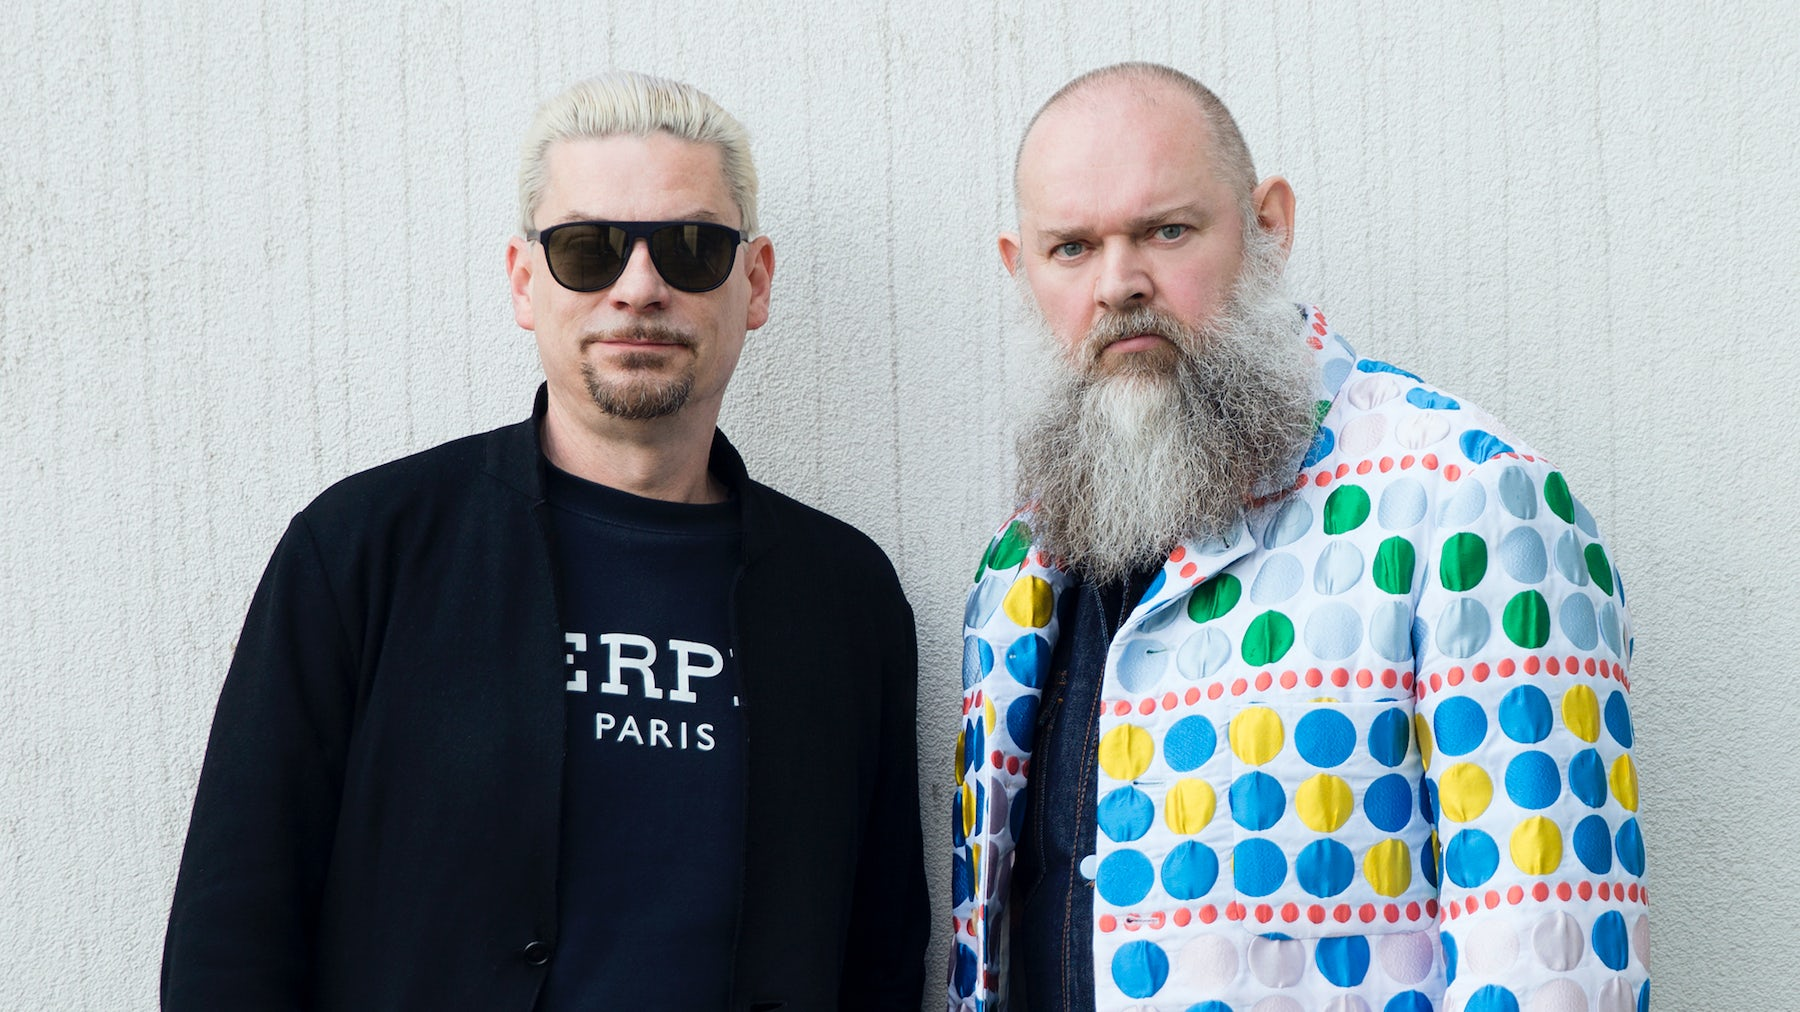 Tony Delcampe (L) and Walter van Beirendonck (R) | Photo: Dirk Alexander